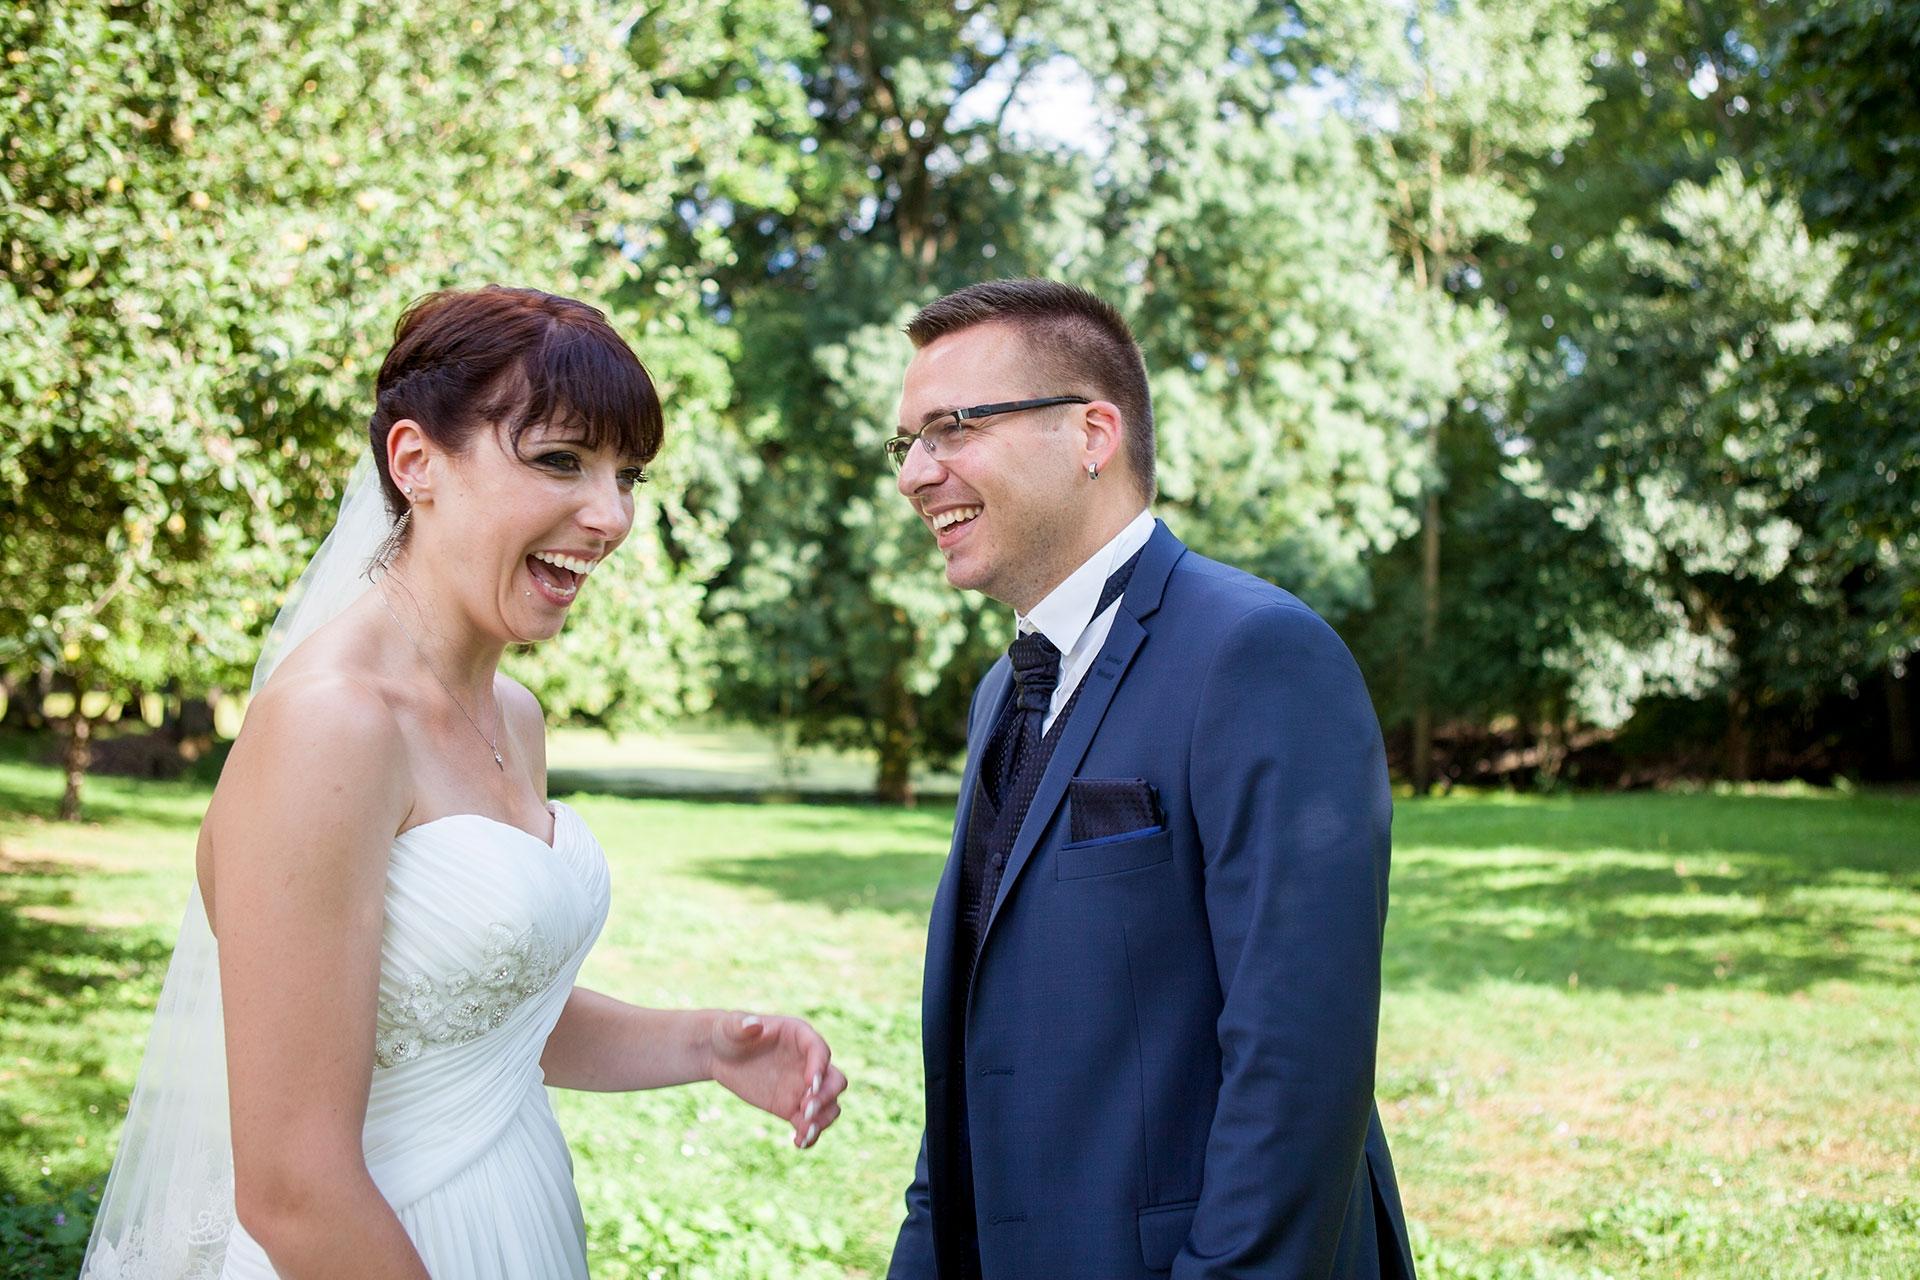 particuliers-evenements-mariages-oui-aurelie&geoffrey-26